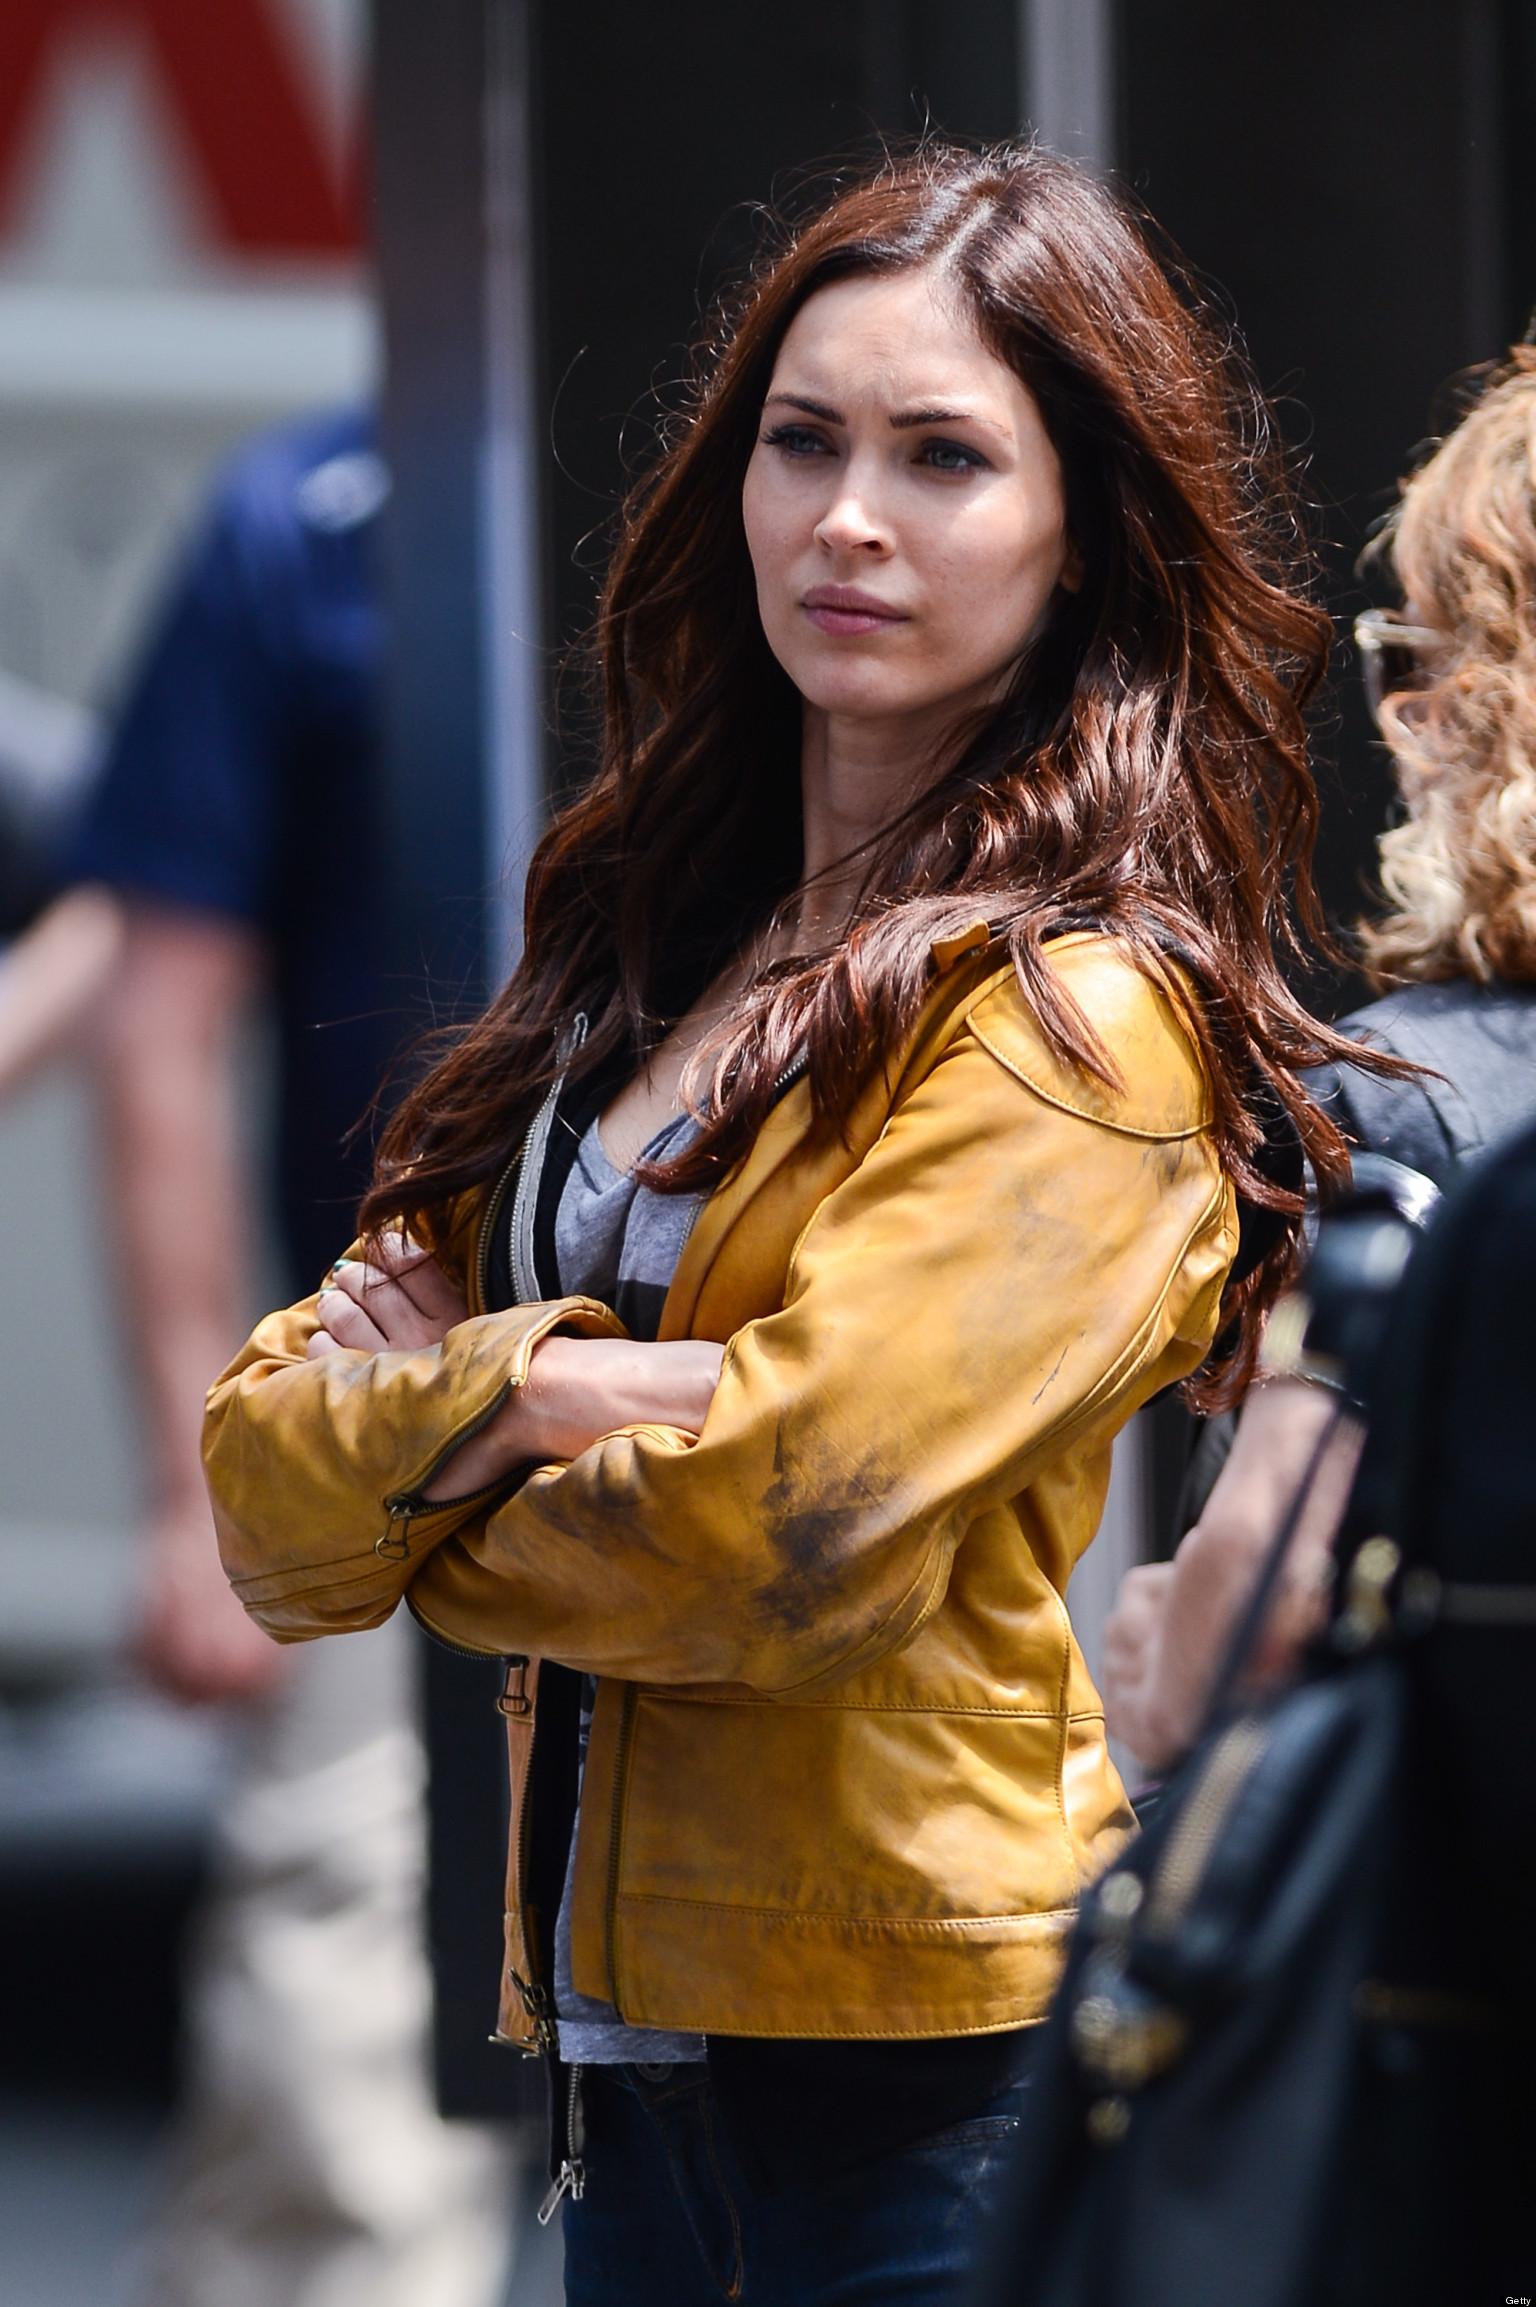 Megan Fox In 'Transformers 4'? Rumor Has Actress Returning ...